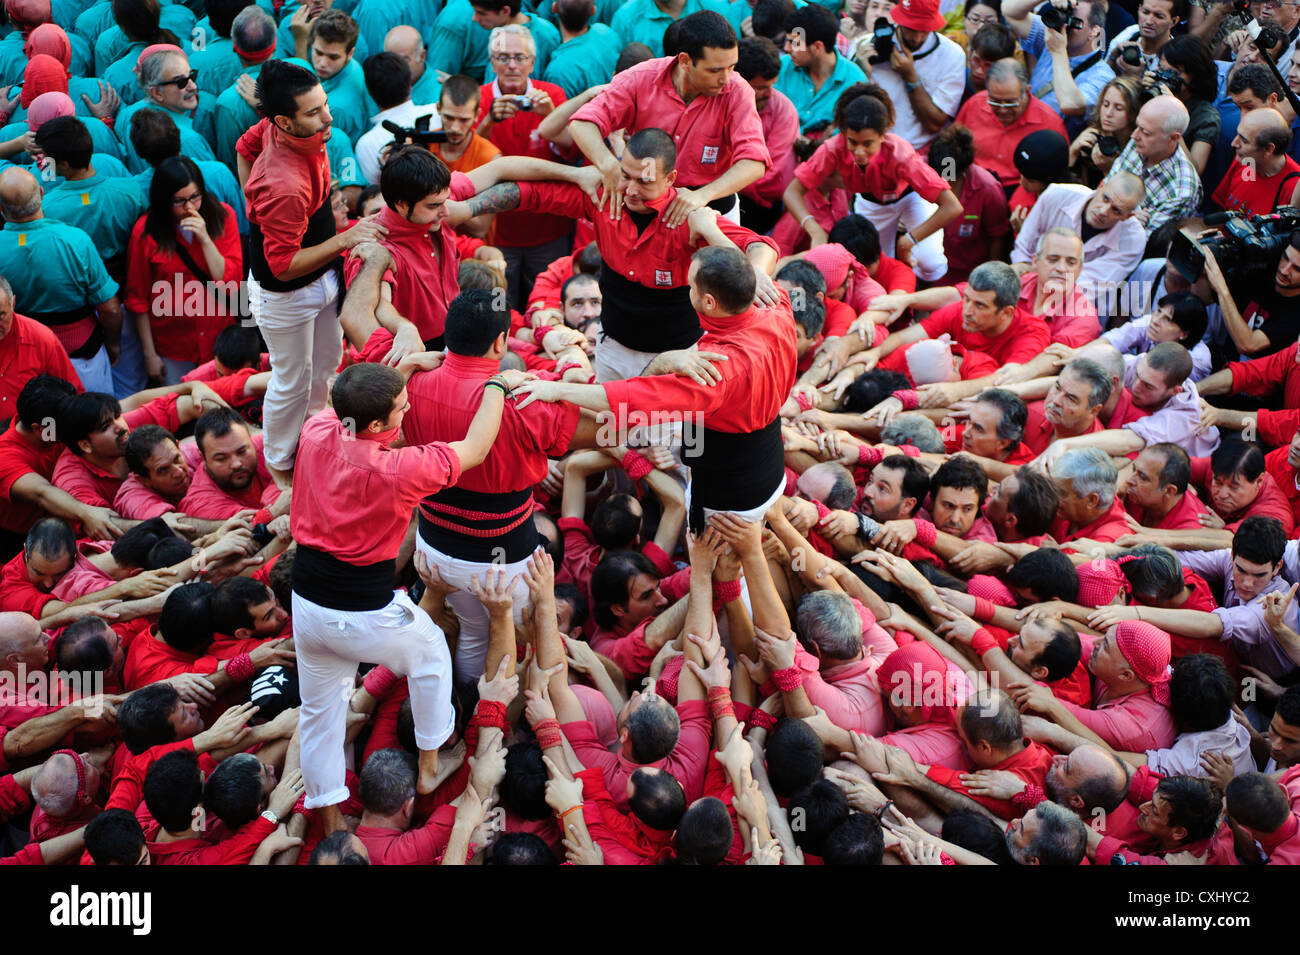 Traditional Castellers building human castles for La merce Festival in Barcelona, Spain. Stock Photo